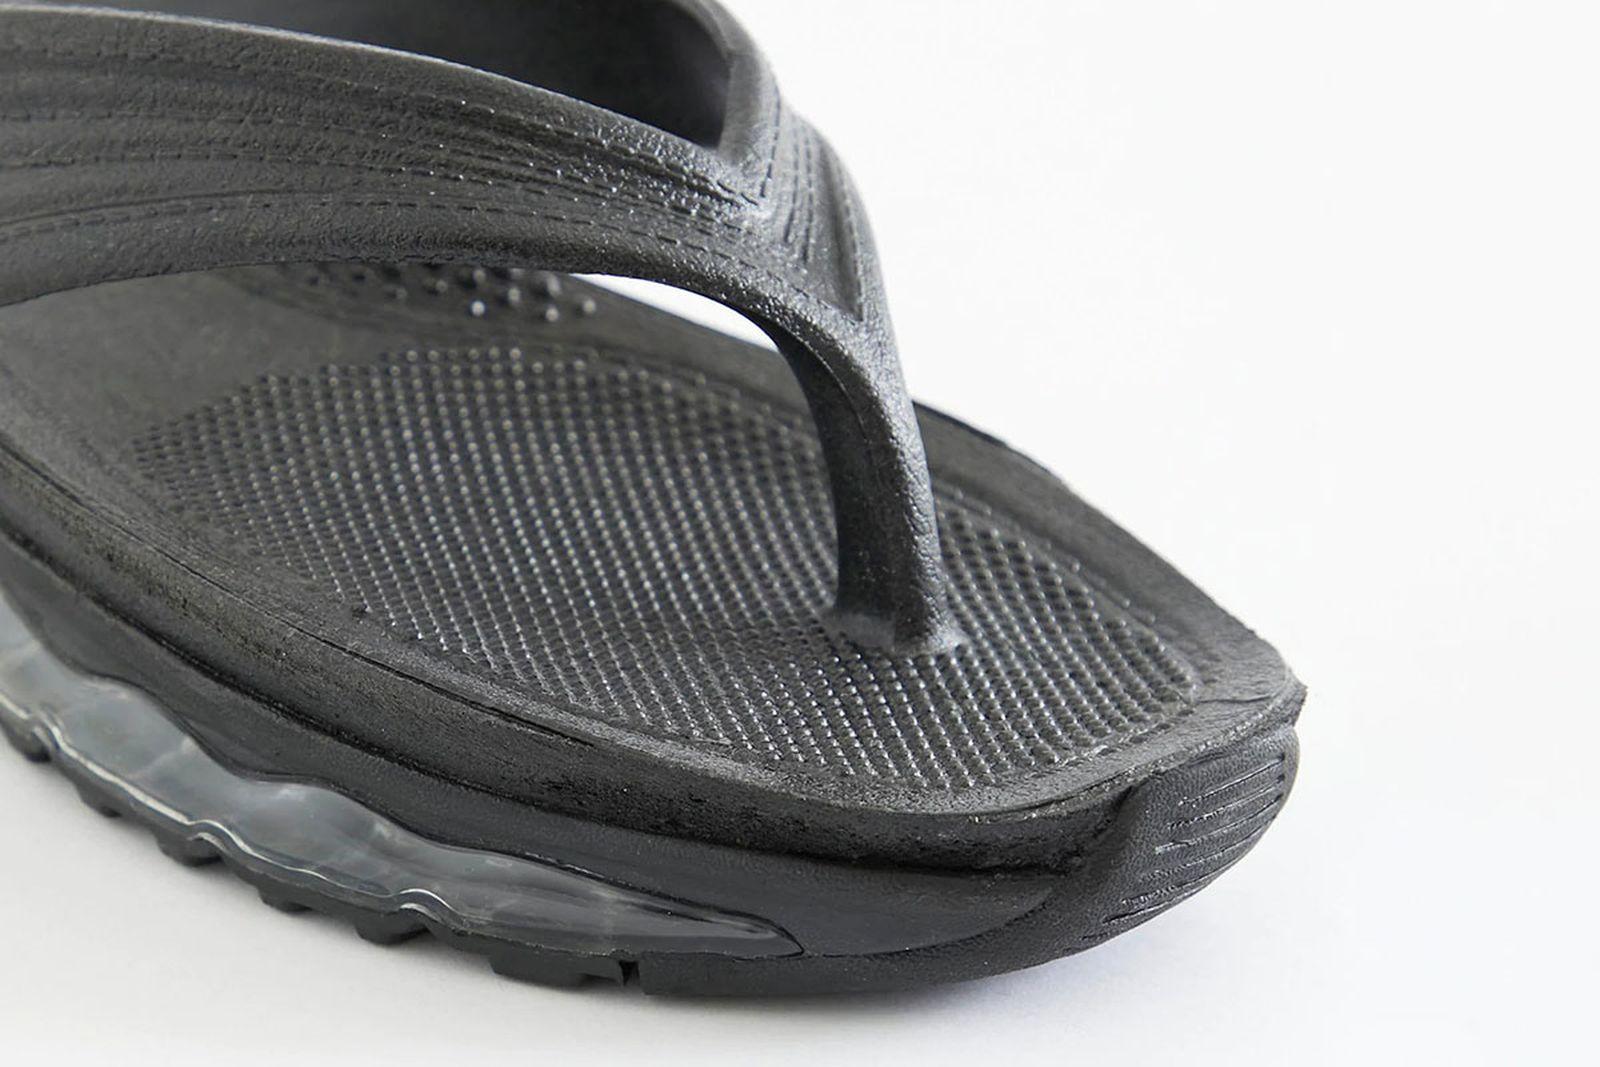 public-tokyo-gyosan-air-sole-sandal-flip-flop- (2)